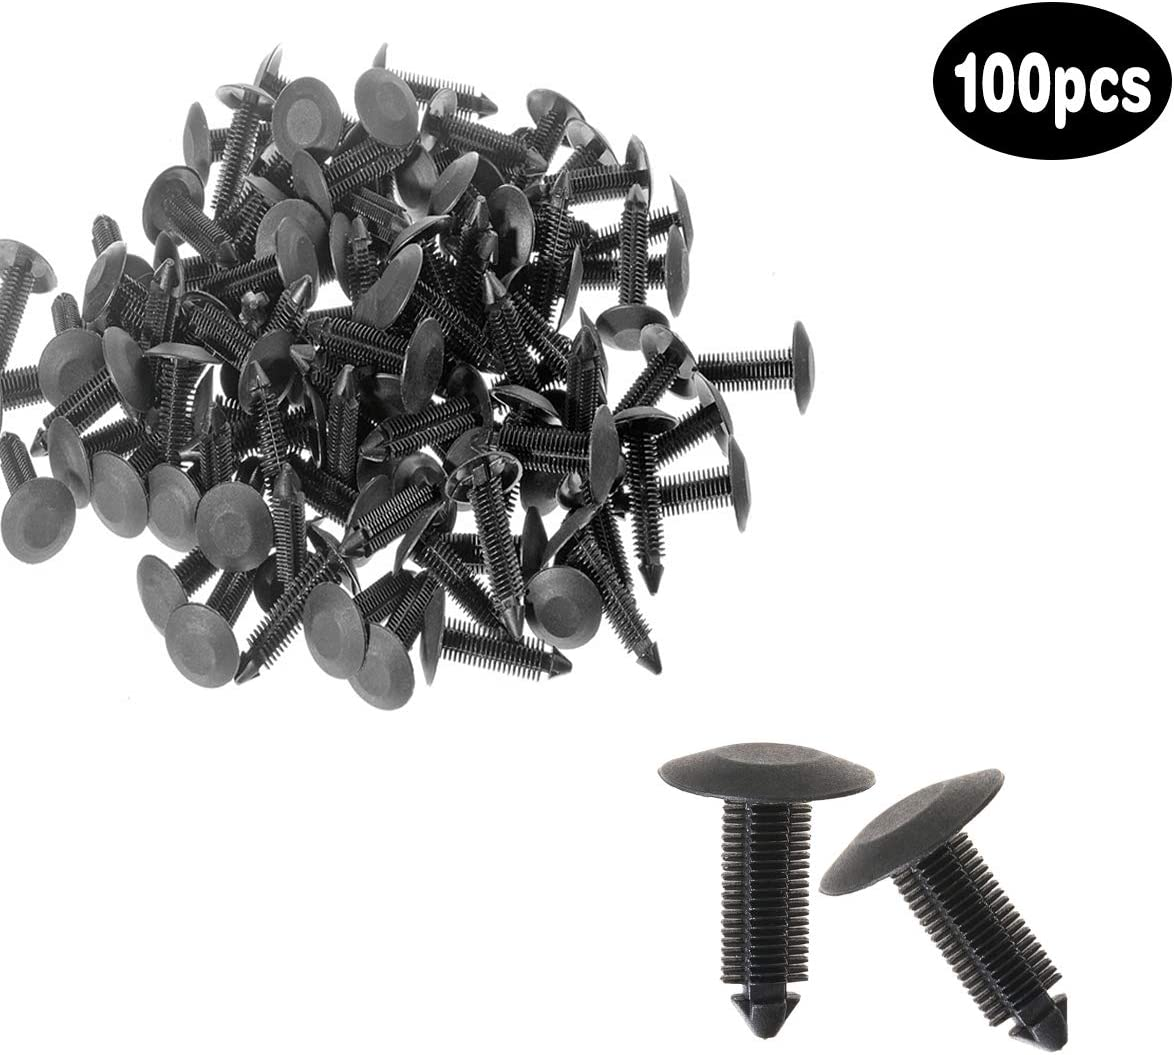 ZYHW Christmas Tree Fastener Rivet Clips Furniture Assembly Shelves Shield Retainer Plastic Nylon 7mm 100Pcs